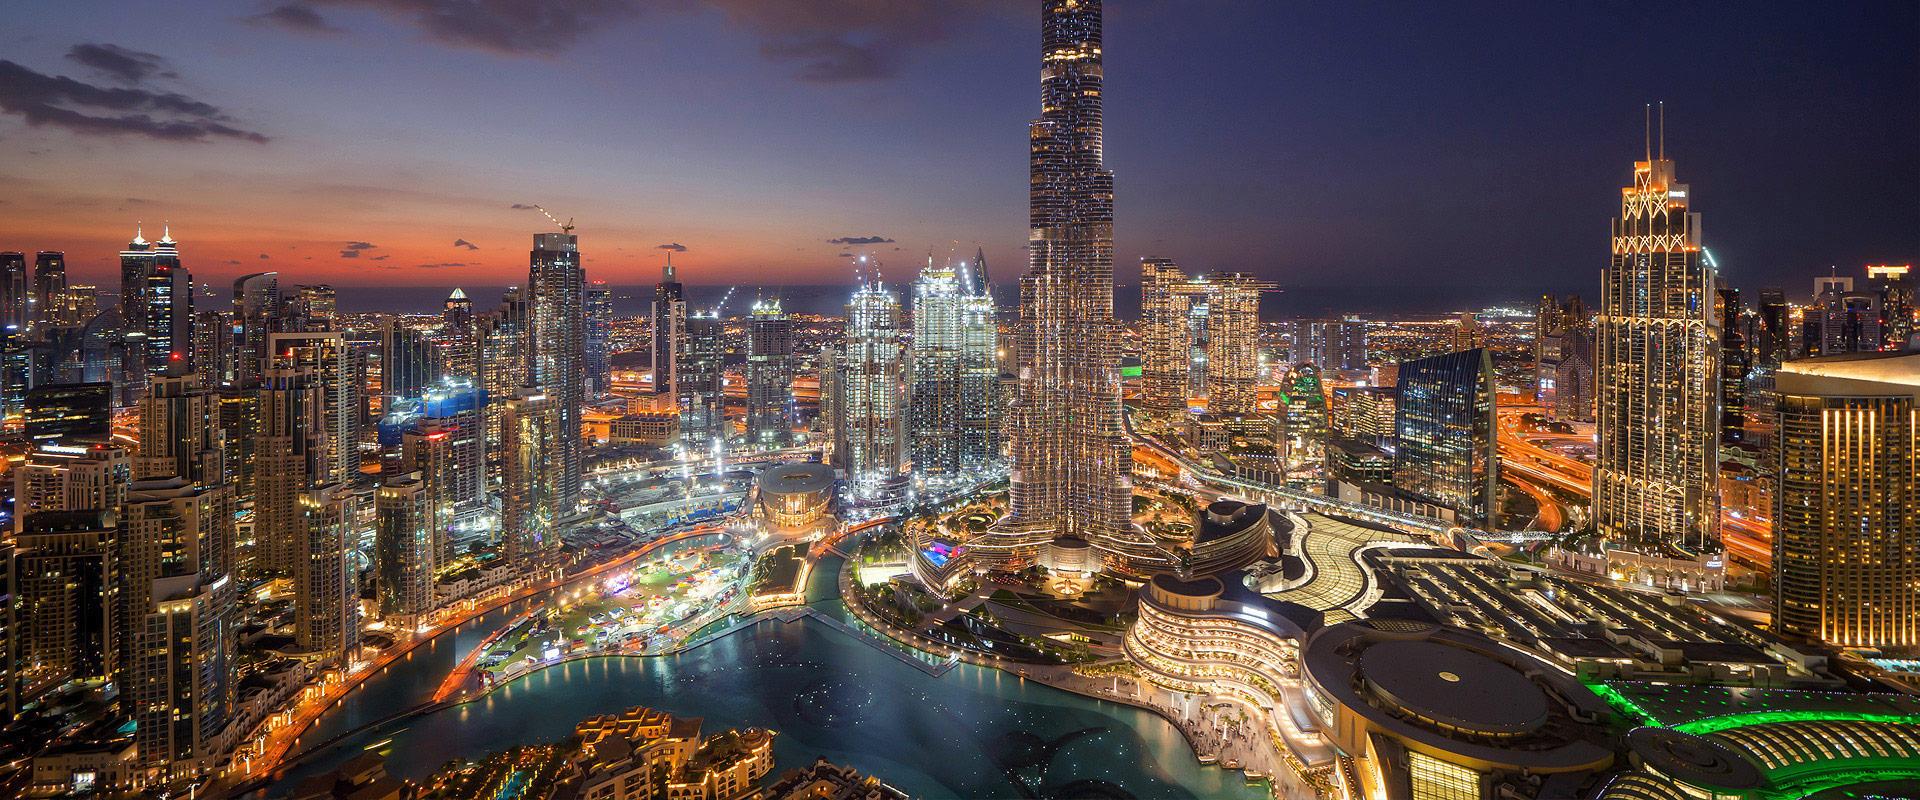 Visa Dubai Online - Contact